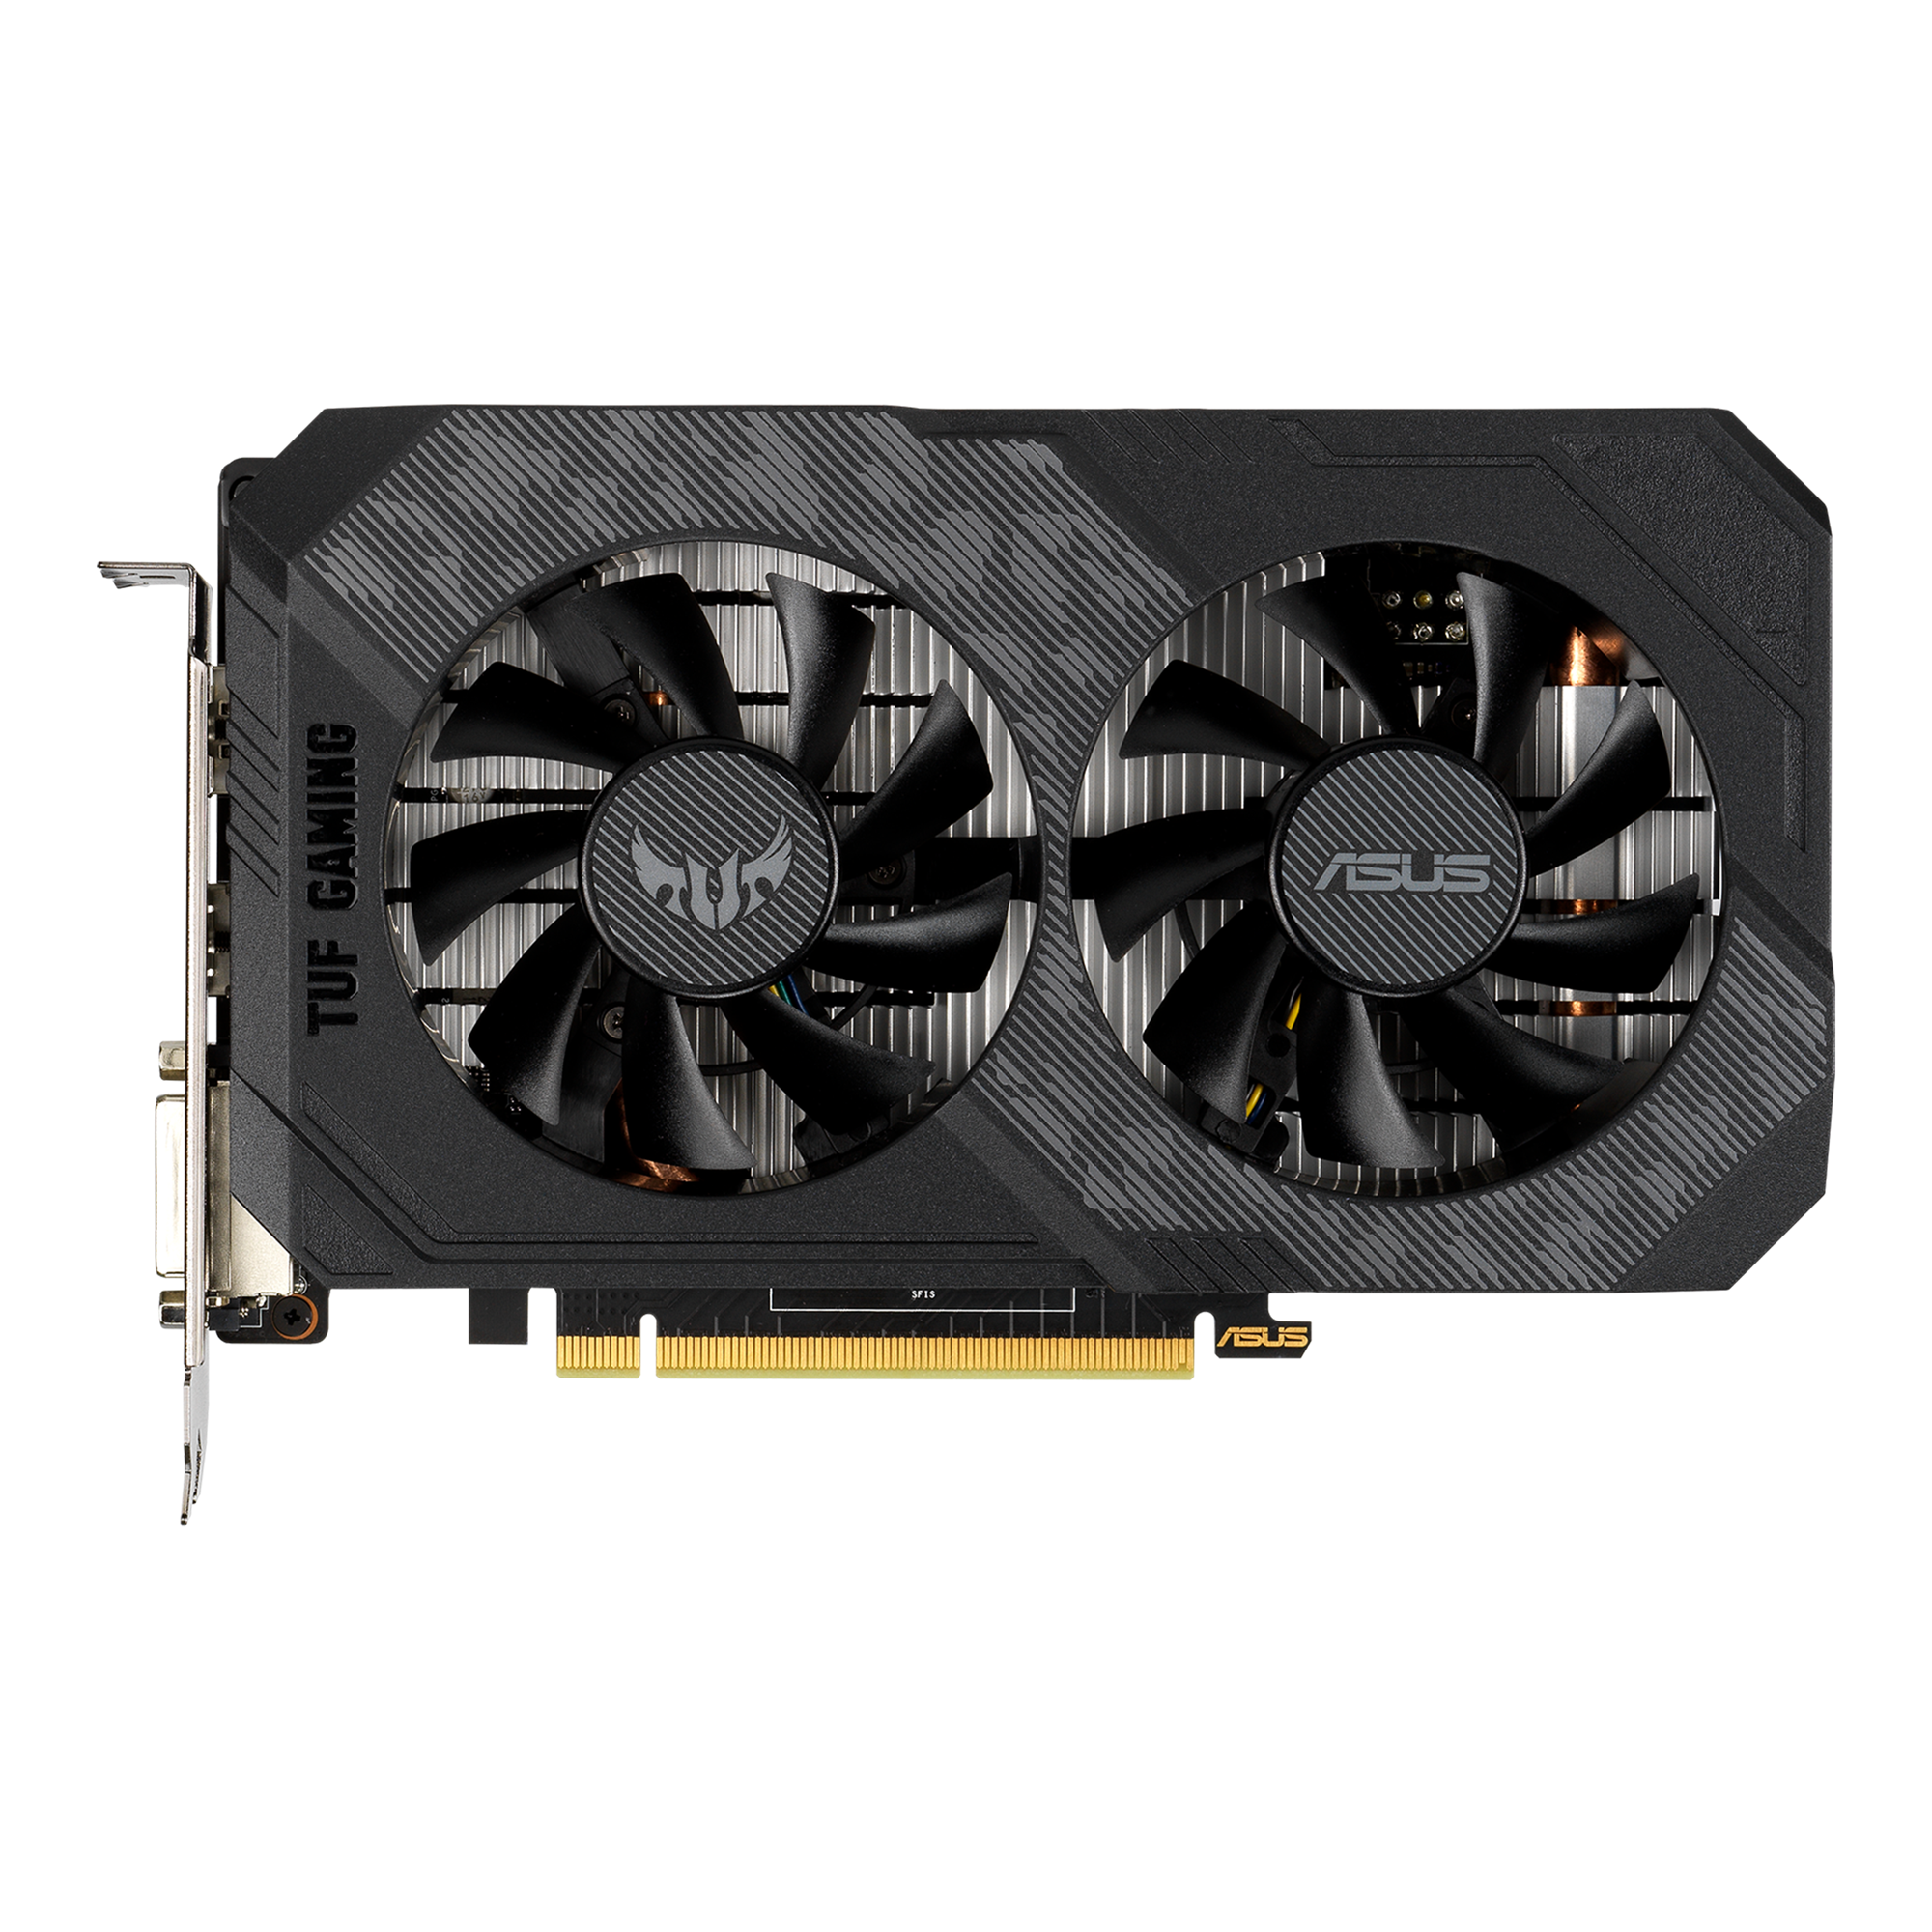 ASUS TUF Gaming NVIDIA GeForce GTX 1650 OC Edition Graphics Card PCIe 3.0, 4GB GDDR6 Memory, HDMI, DisplayPort, DVI-D, IP5X Dust Resistance, Space-Grade Lubricant